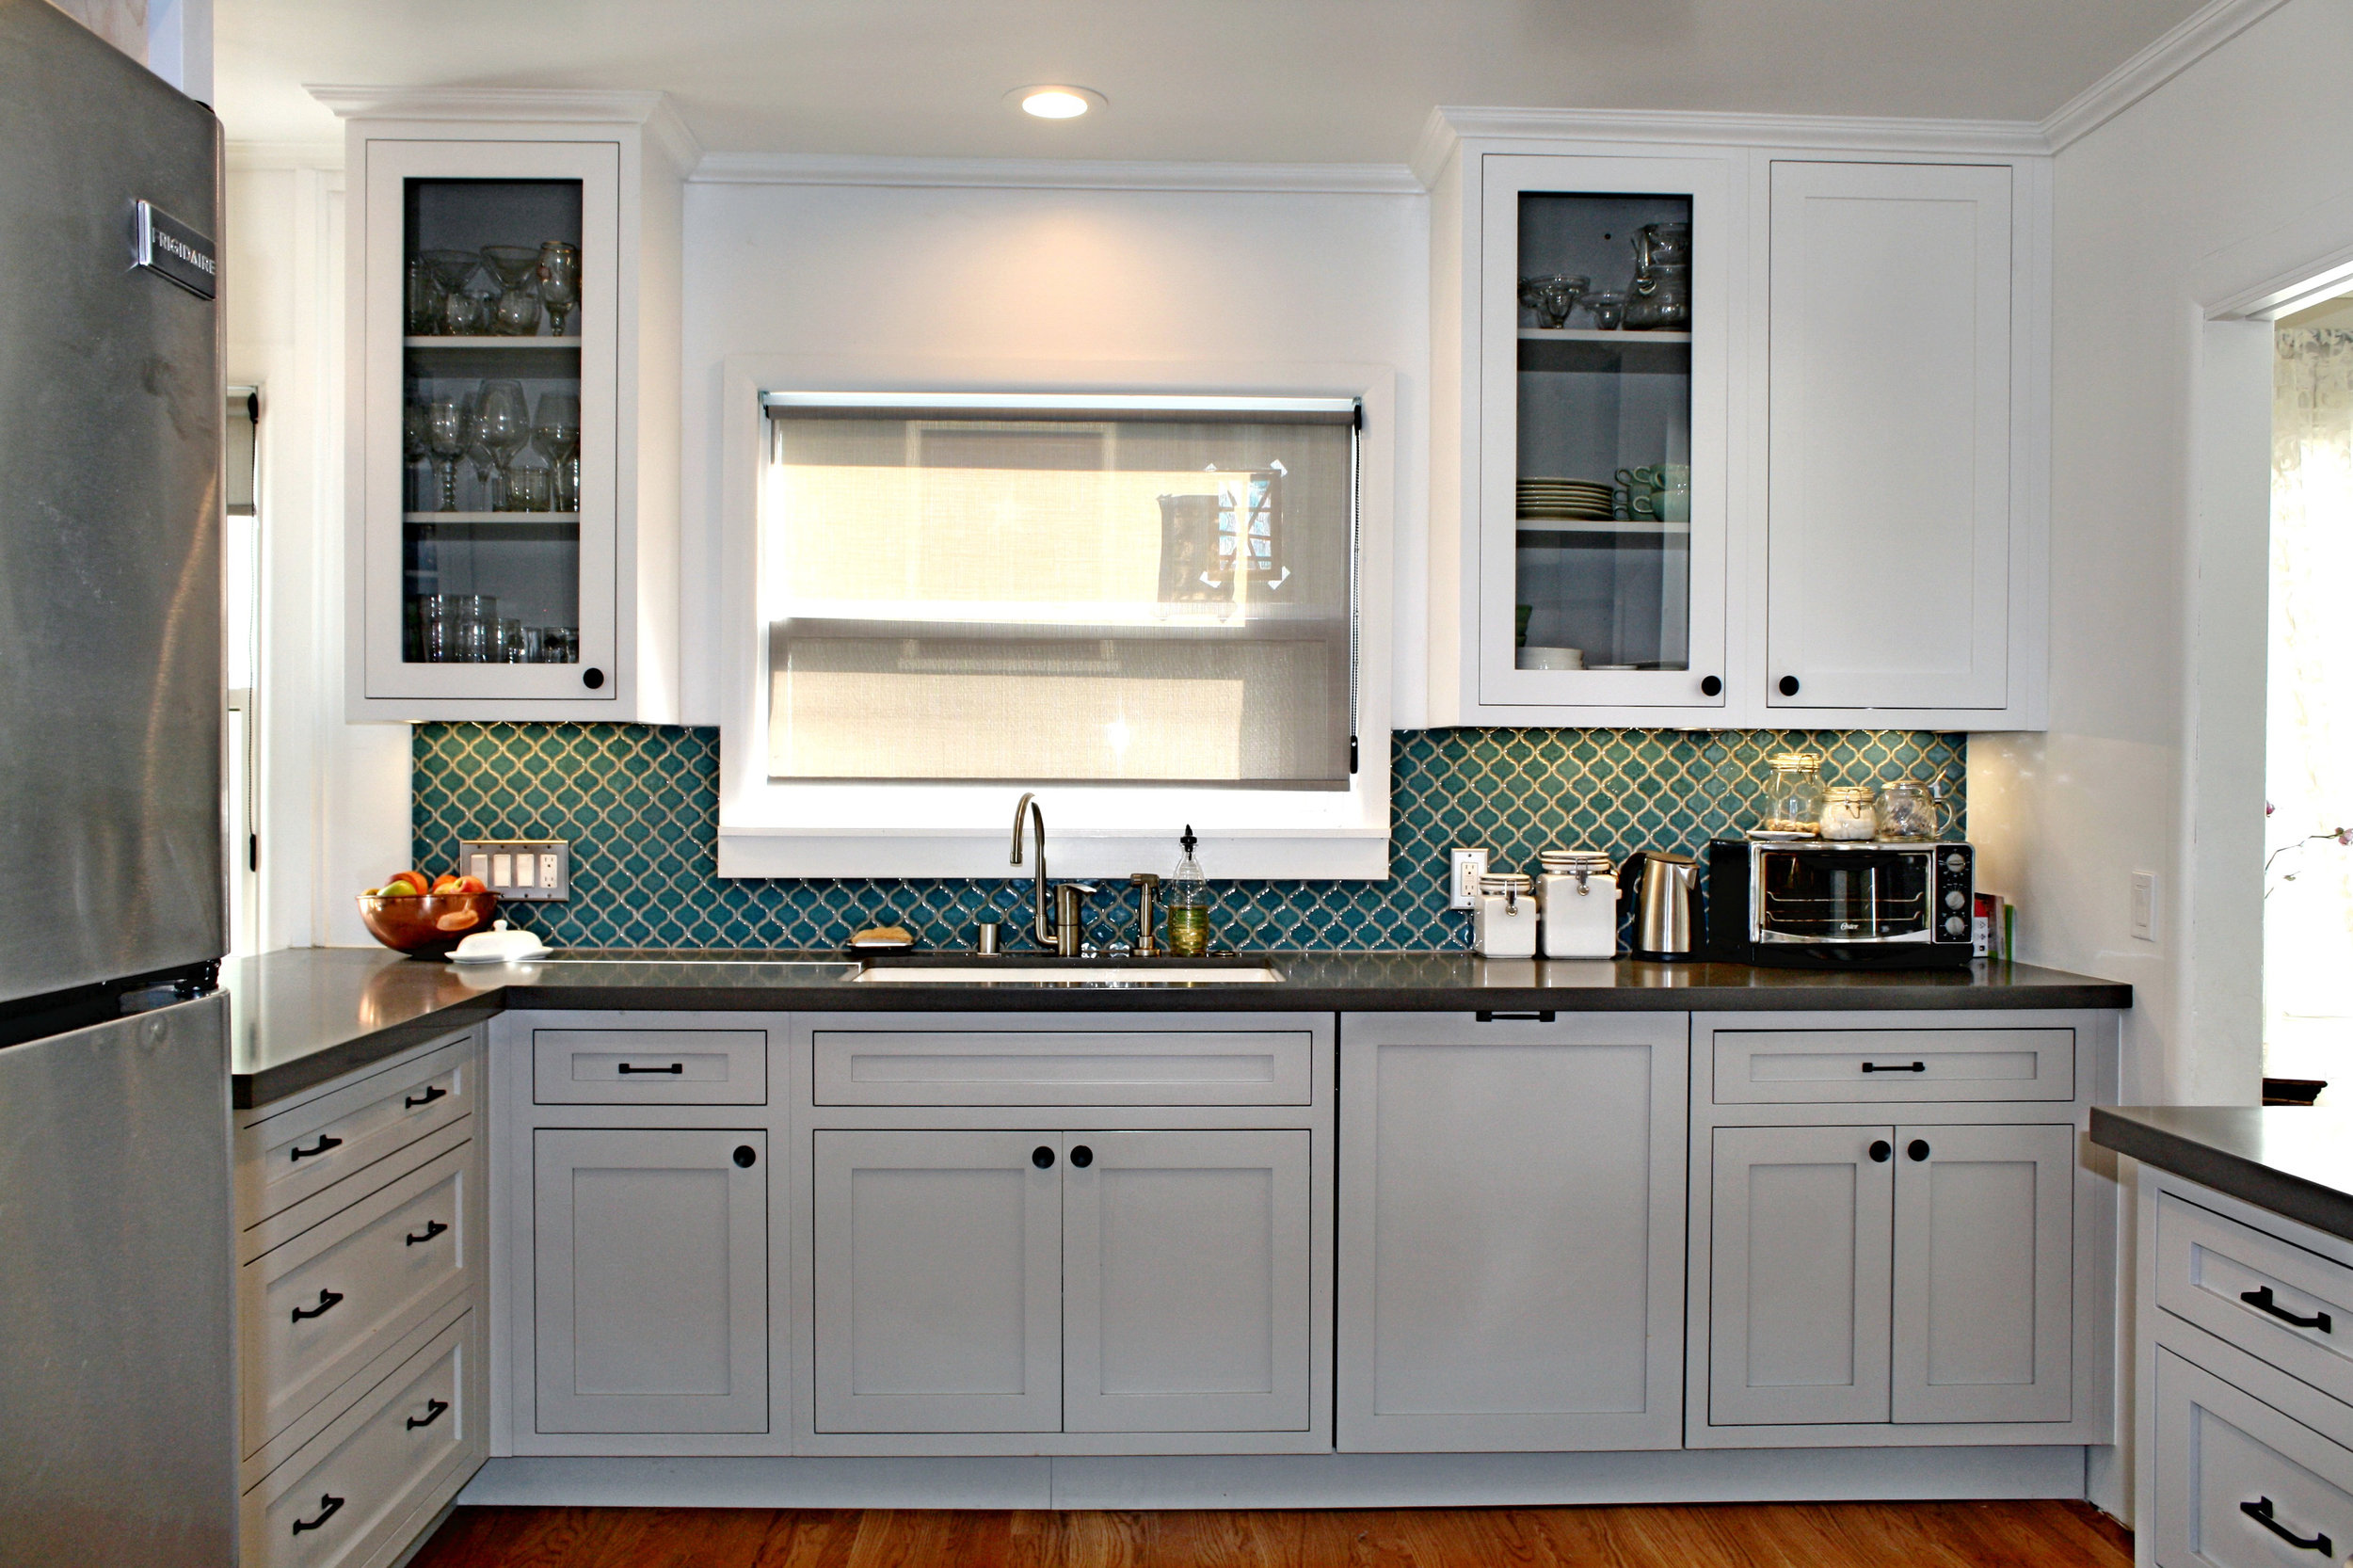 william-adams-design-christmas-tree-lane-3-kitchen-grey-cabinets-wood-floors-blue-tile-backsplash.jpg